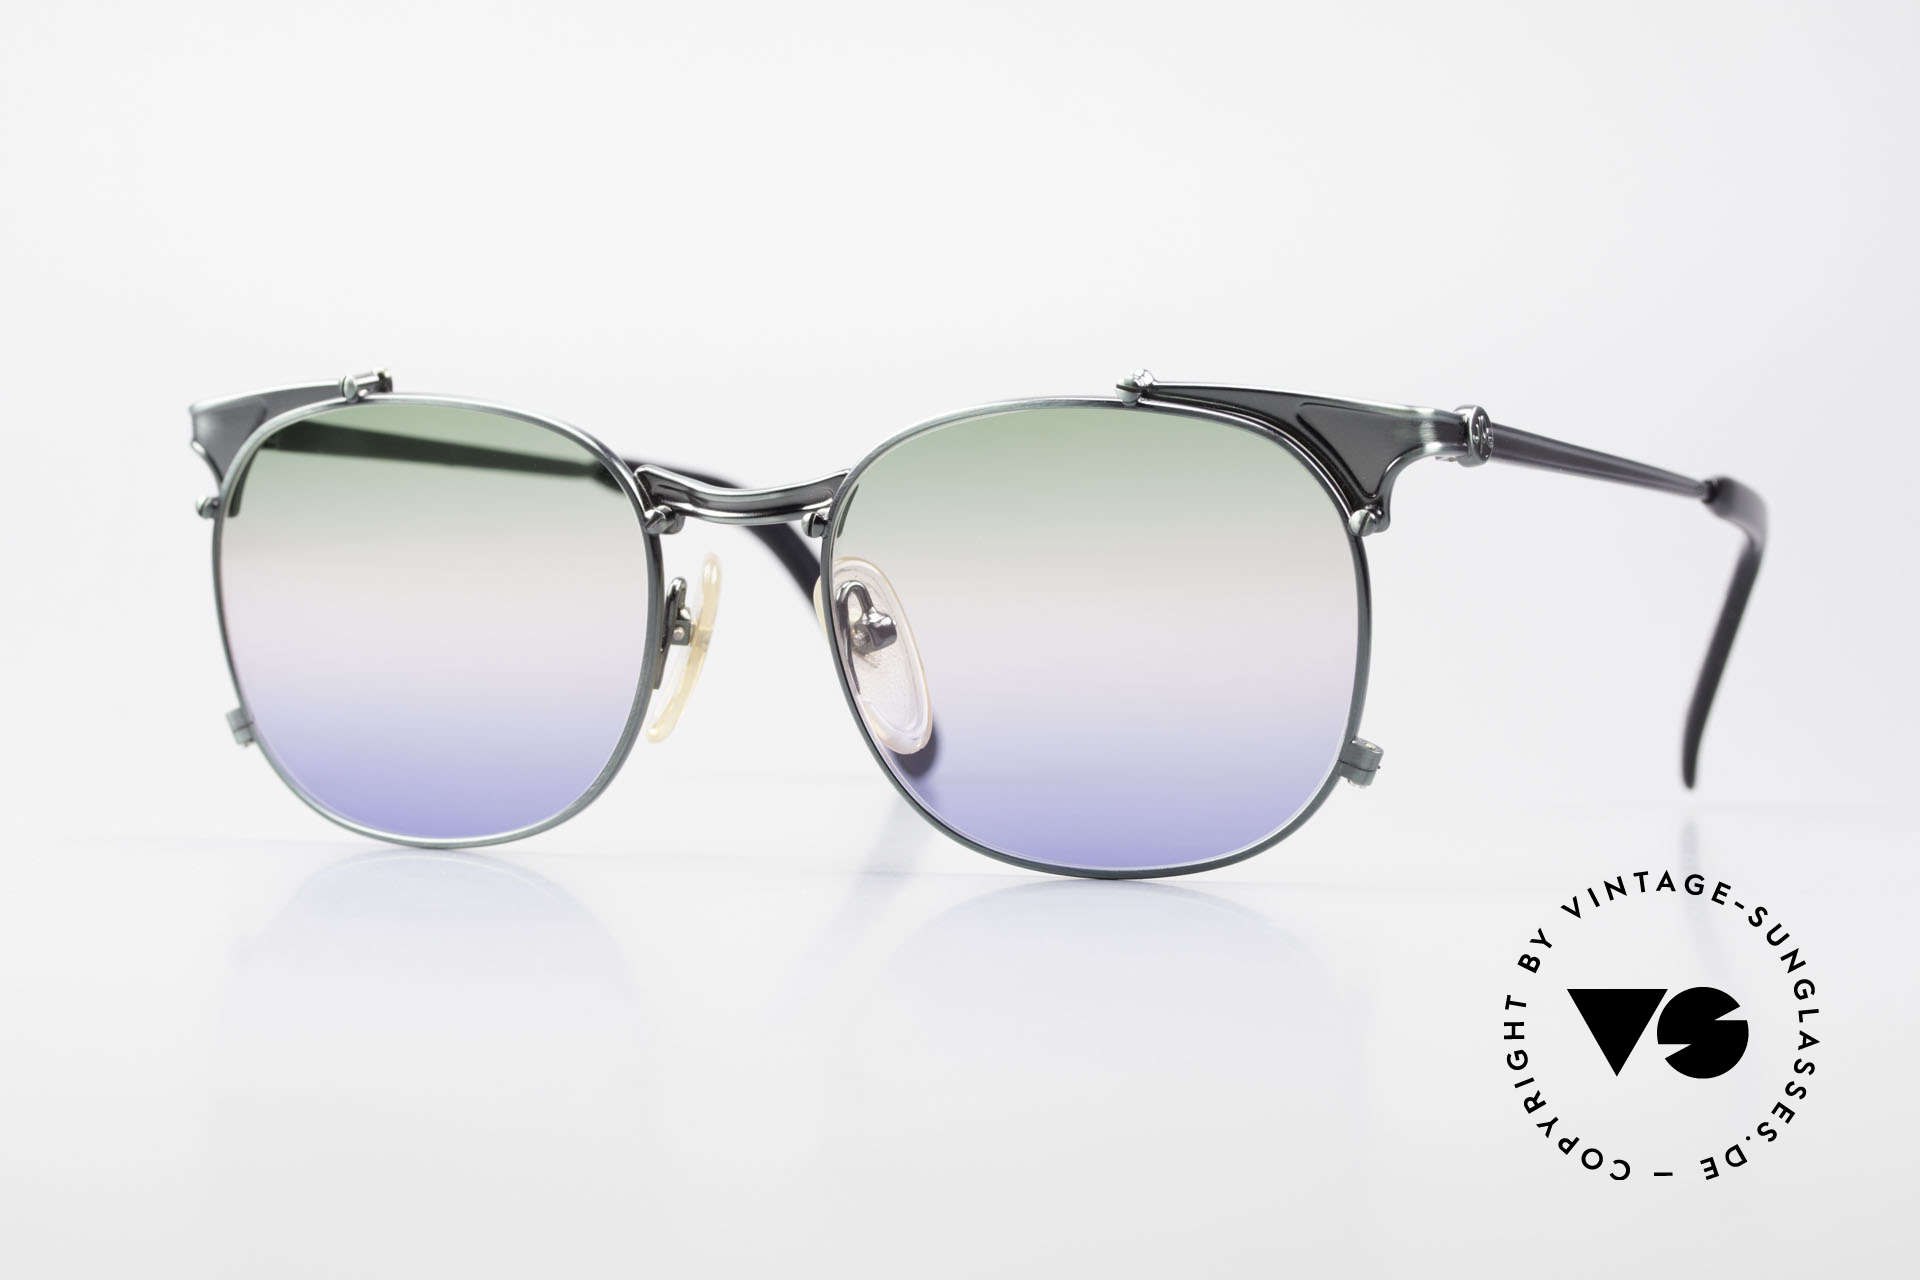 Jean Paul Gaultier 56-2175 Rare Tricolored Sun Lenses, rare vintage JEAN PAUL GAULTIER sunglasses, Made for Men and Women